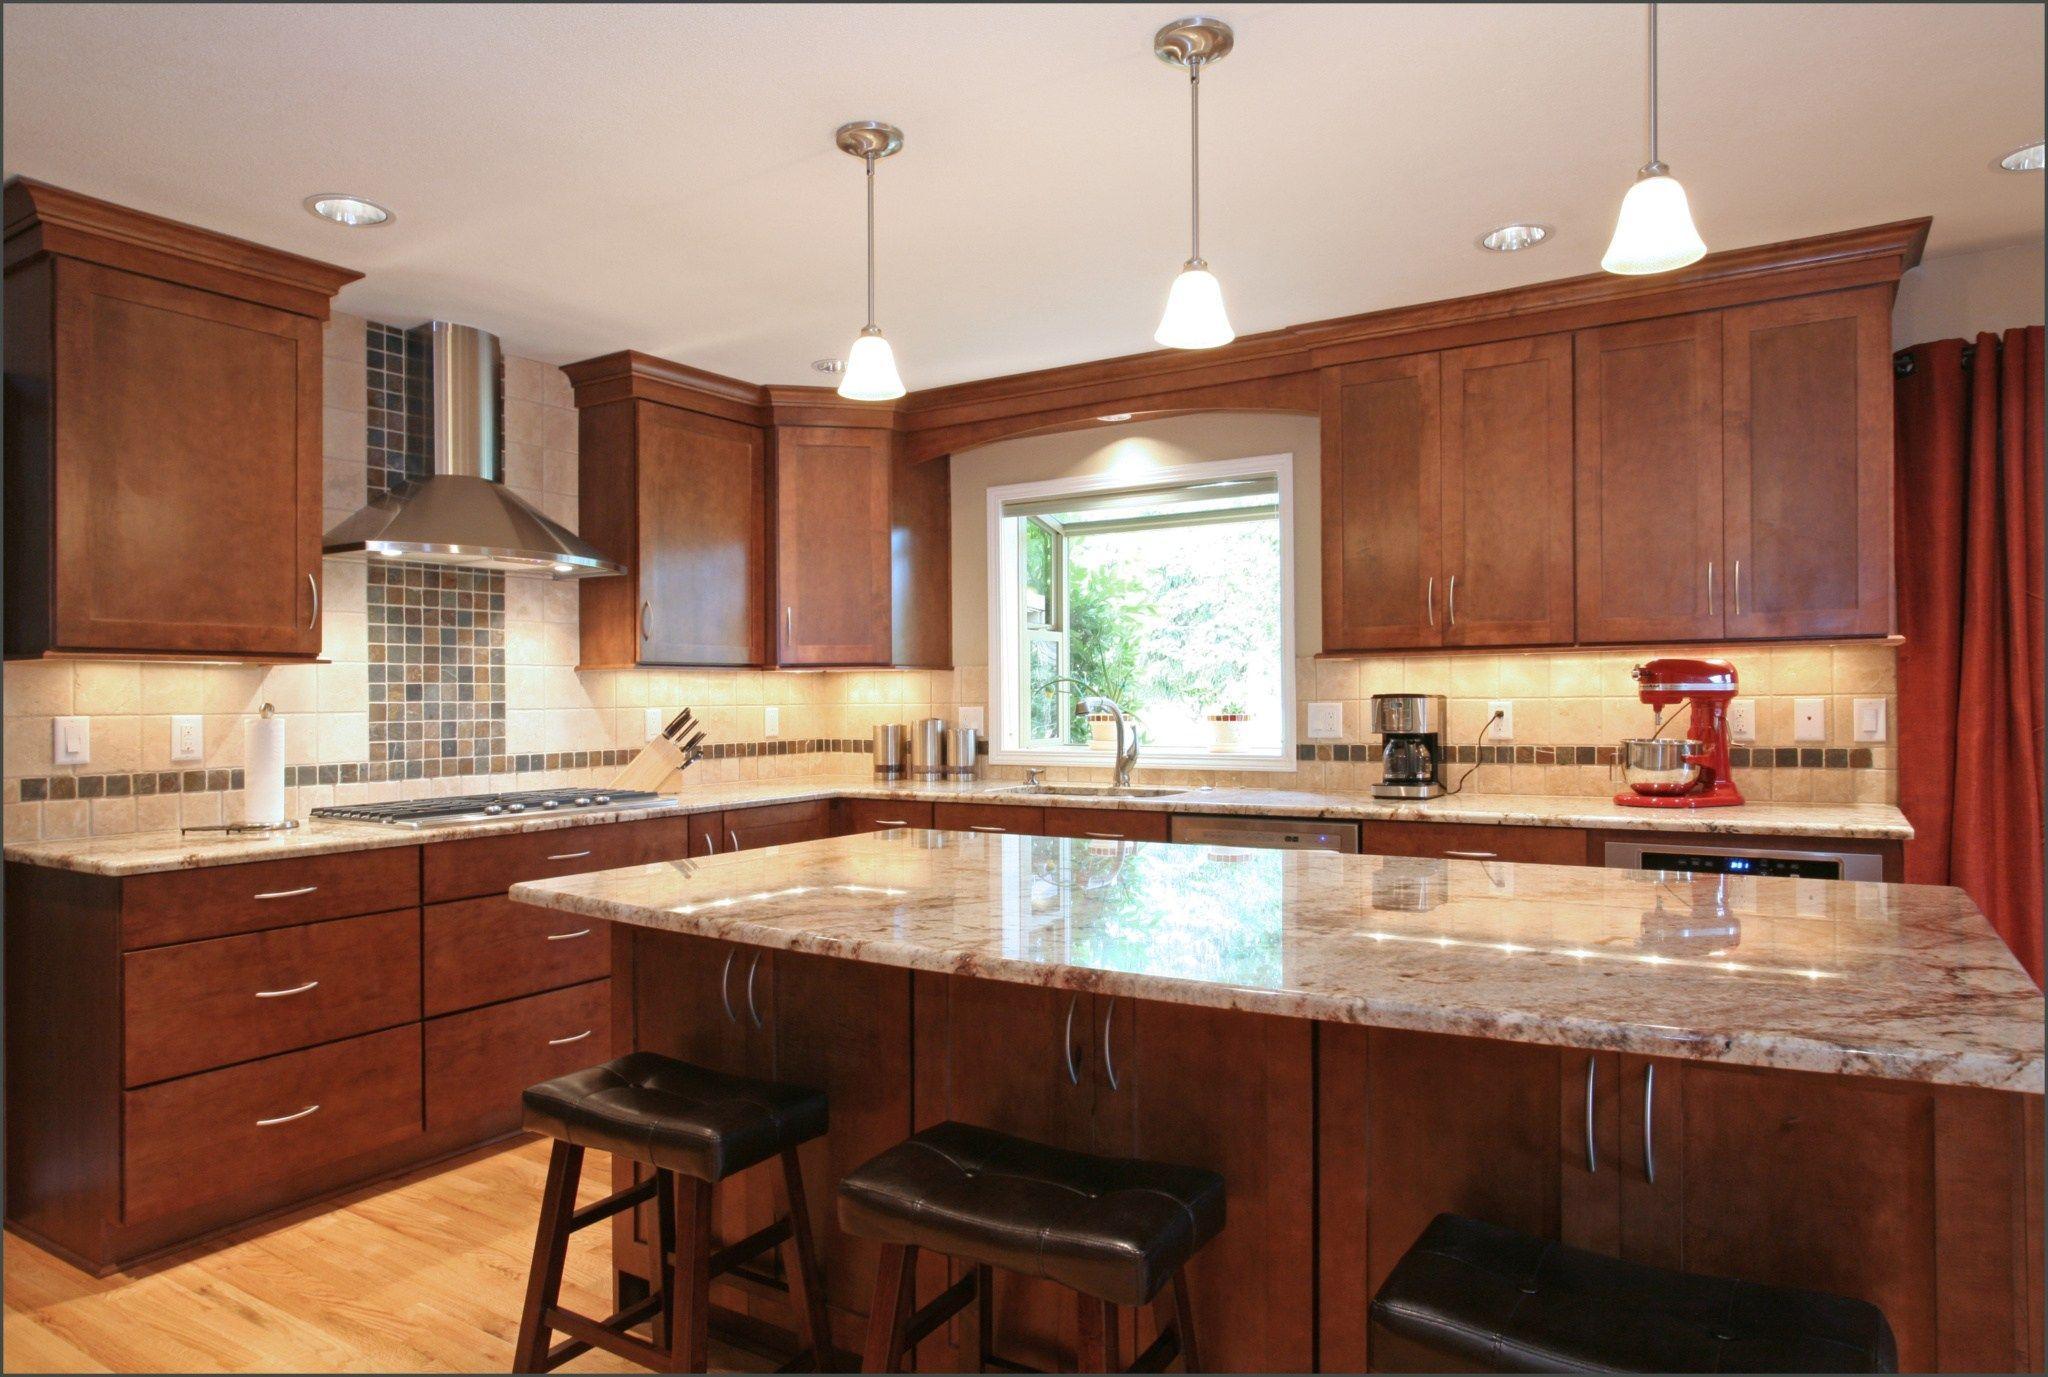 cool remodel kitchen design ideas kitchenremodelingcompanies rh pinterest com